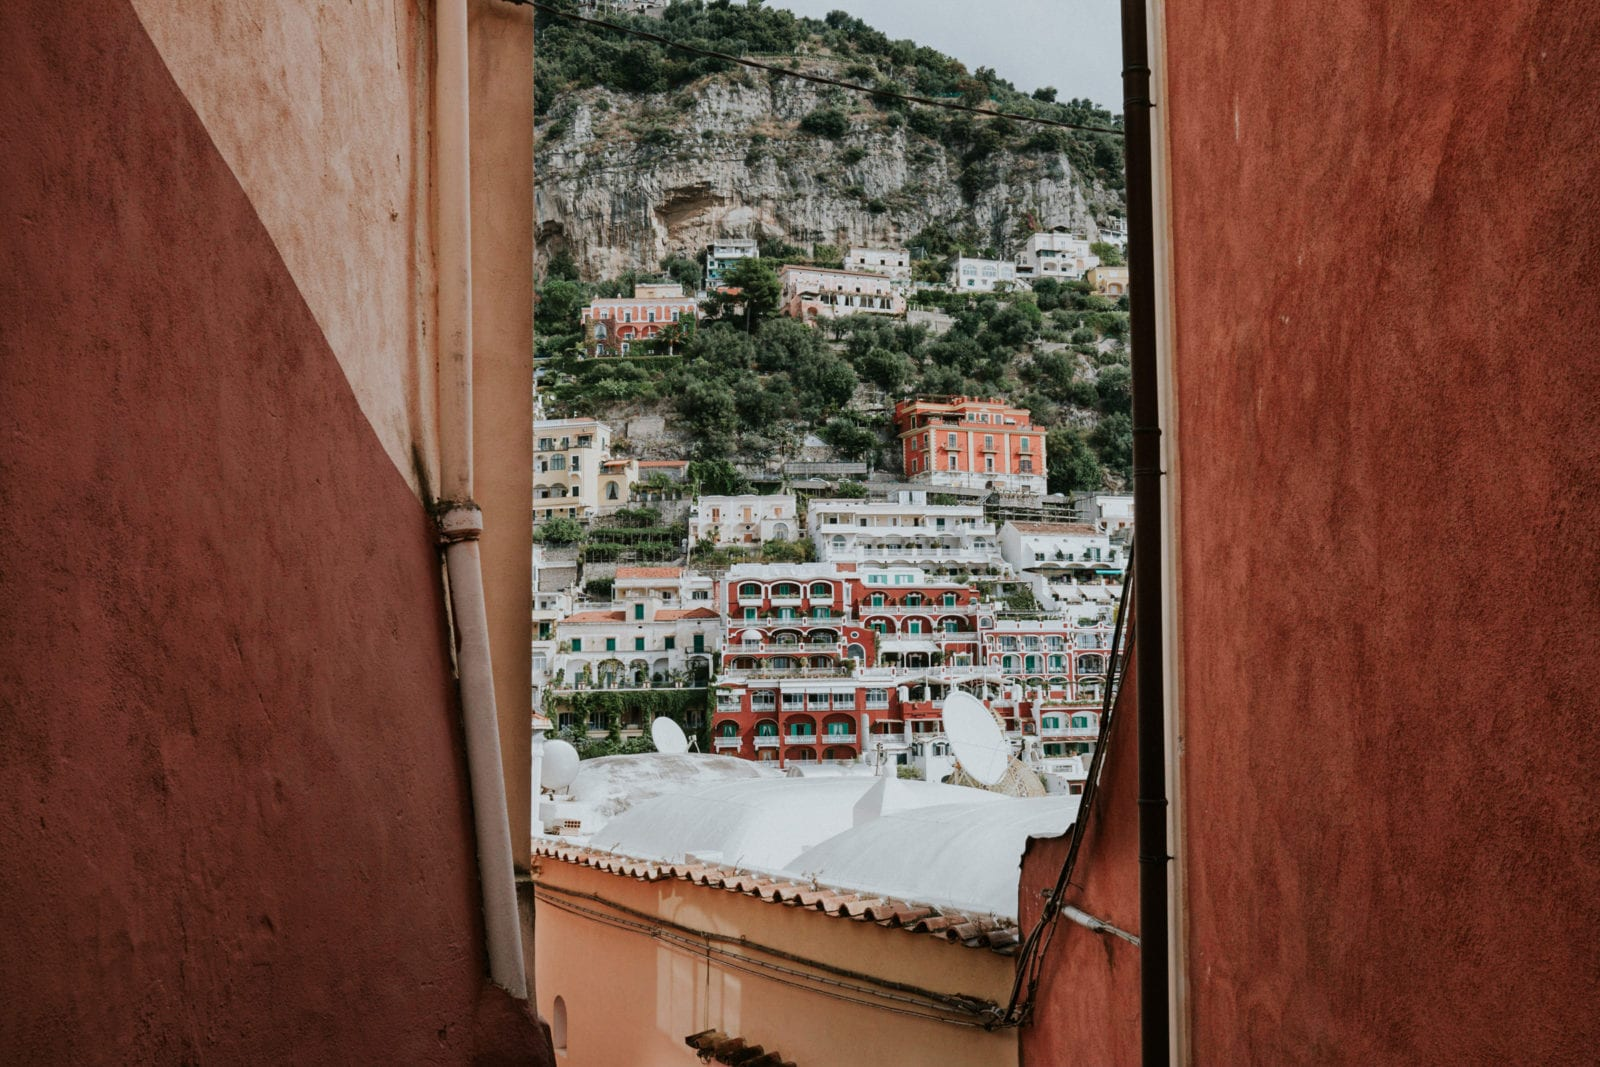 Streets in Positano Italy Instagram Location